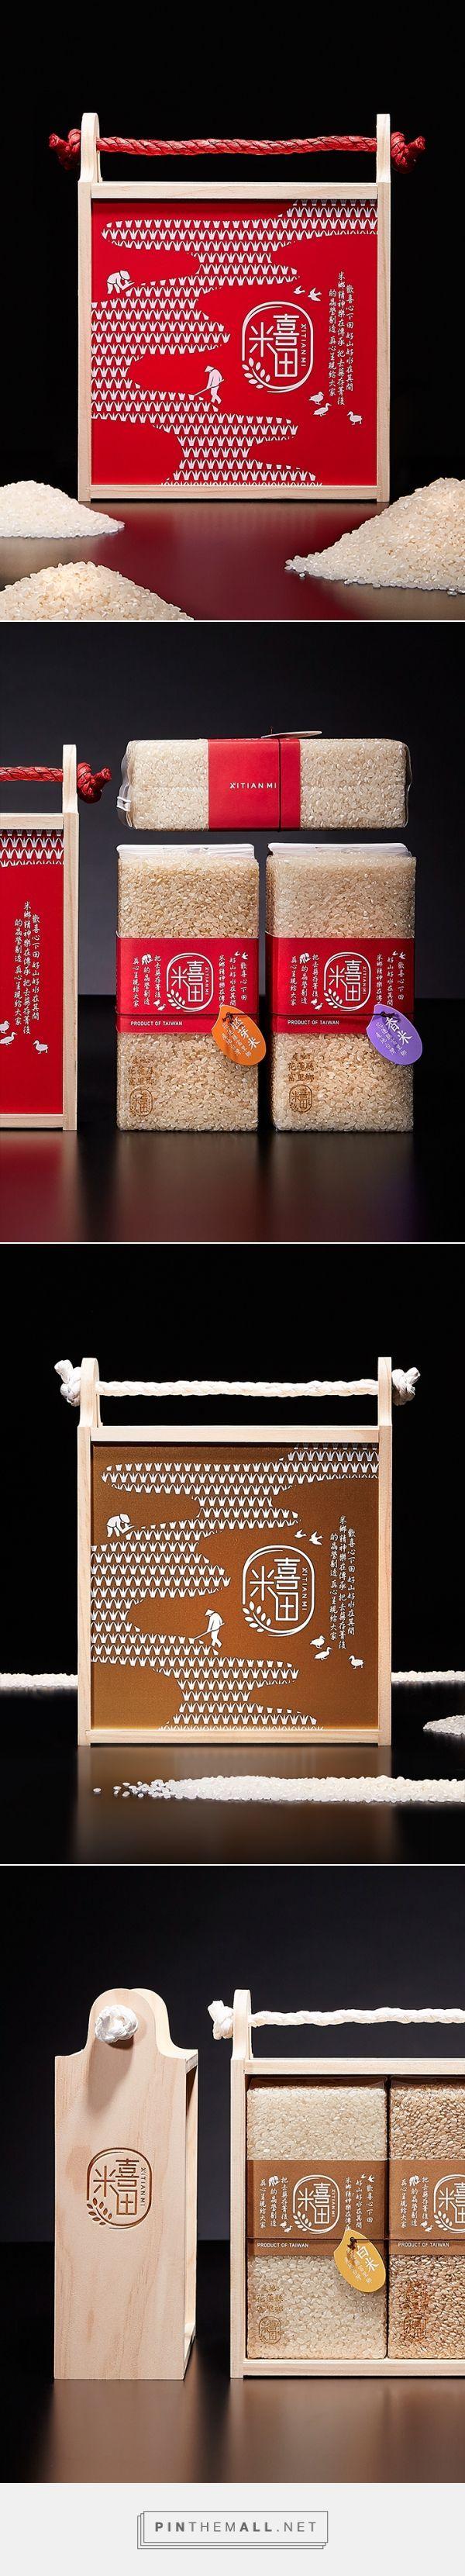 XITIAN MI rice by Kun Design. Source: World Packaging Design Society #packaging #design #structural